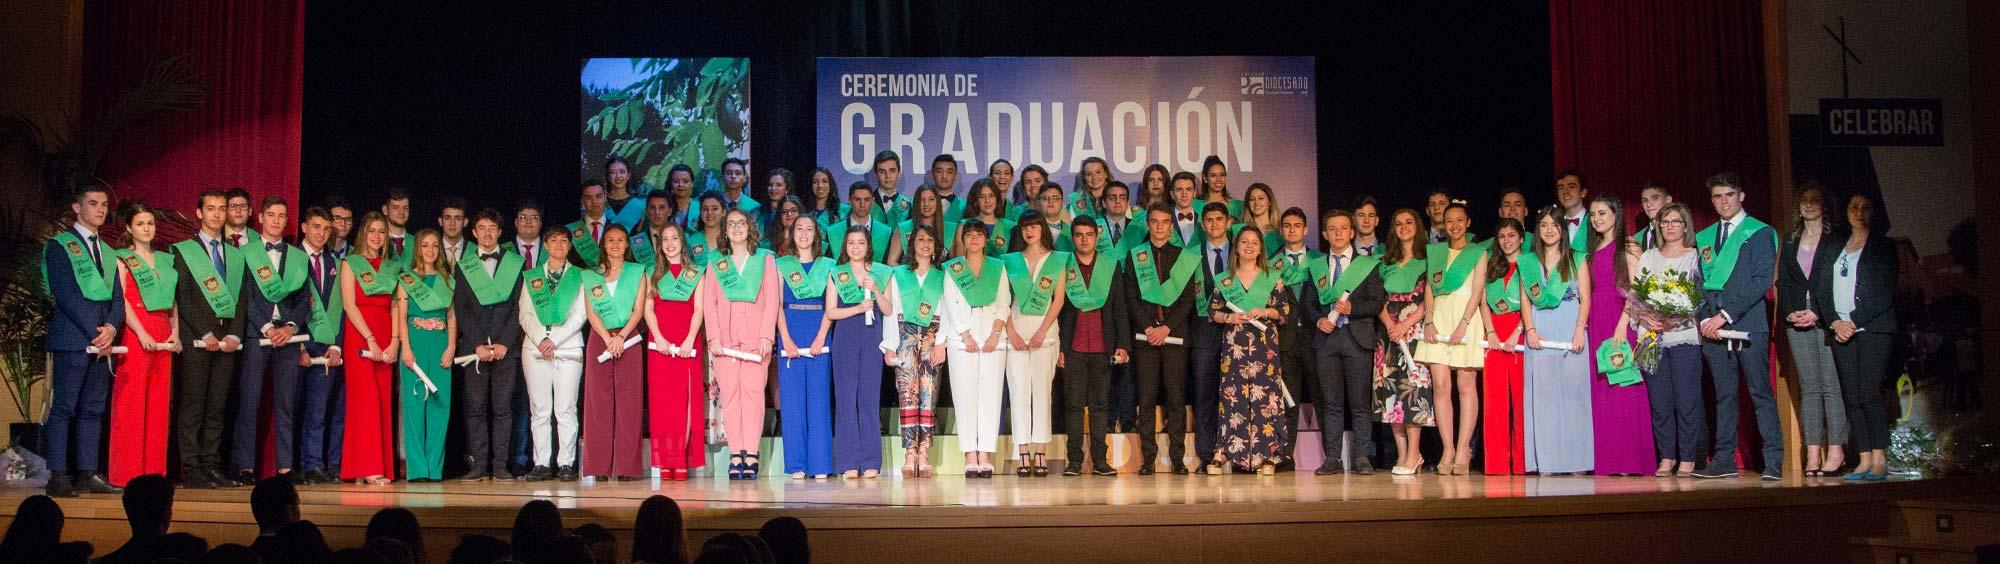 graduacion-bach-18